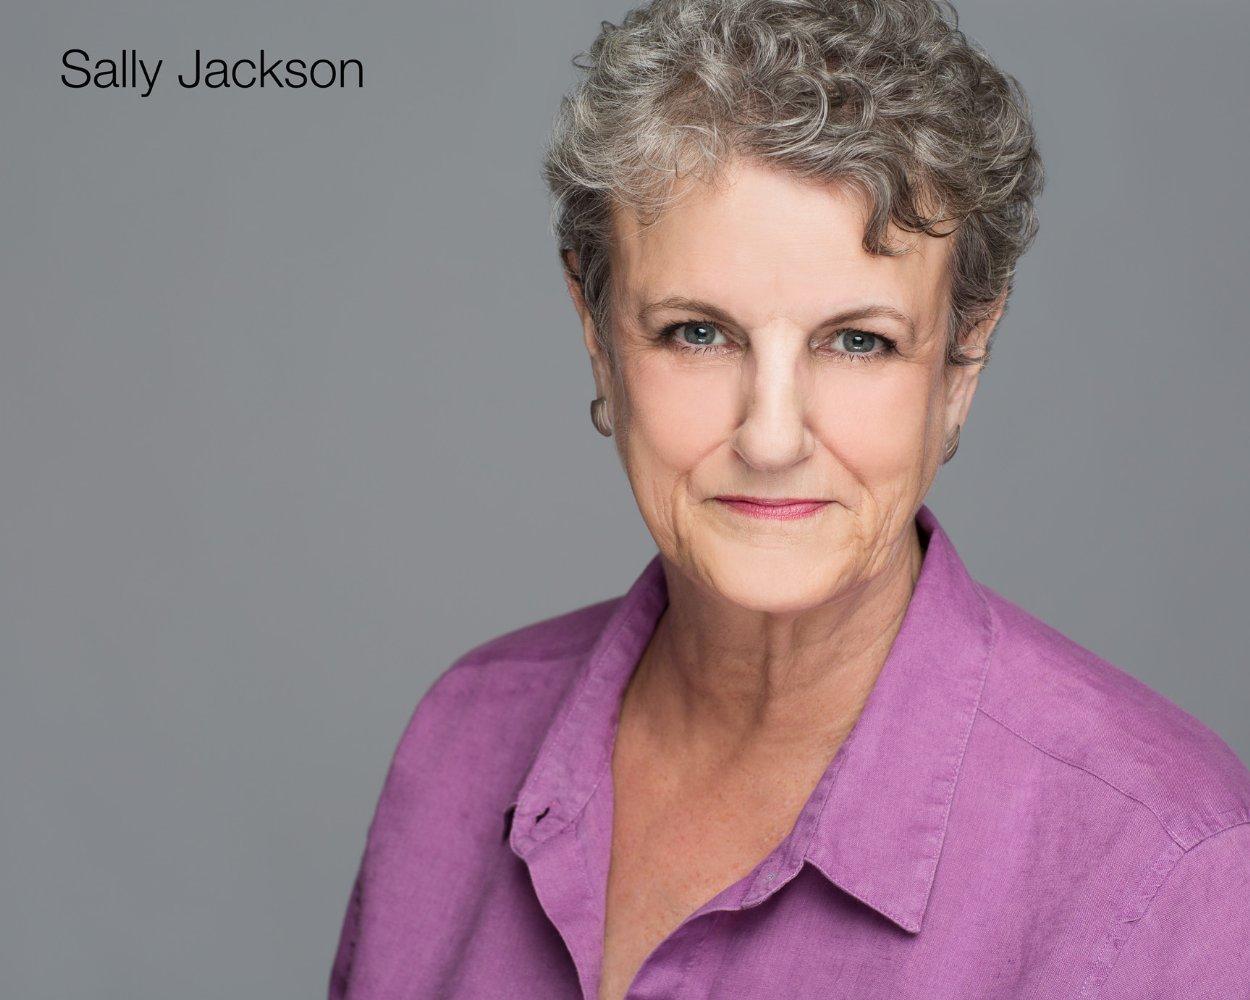 Sally Jackson